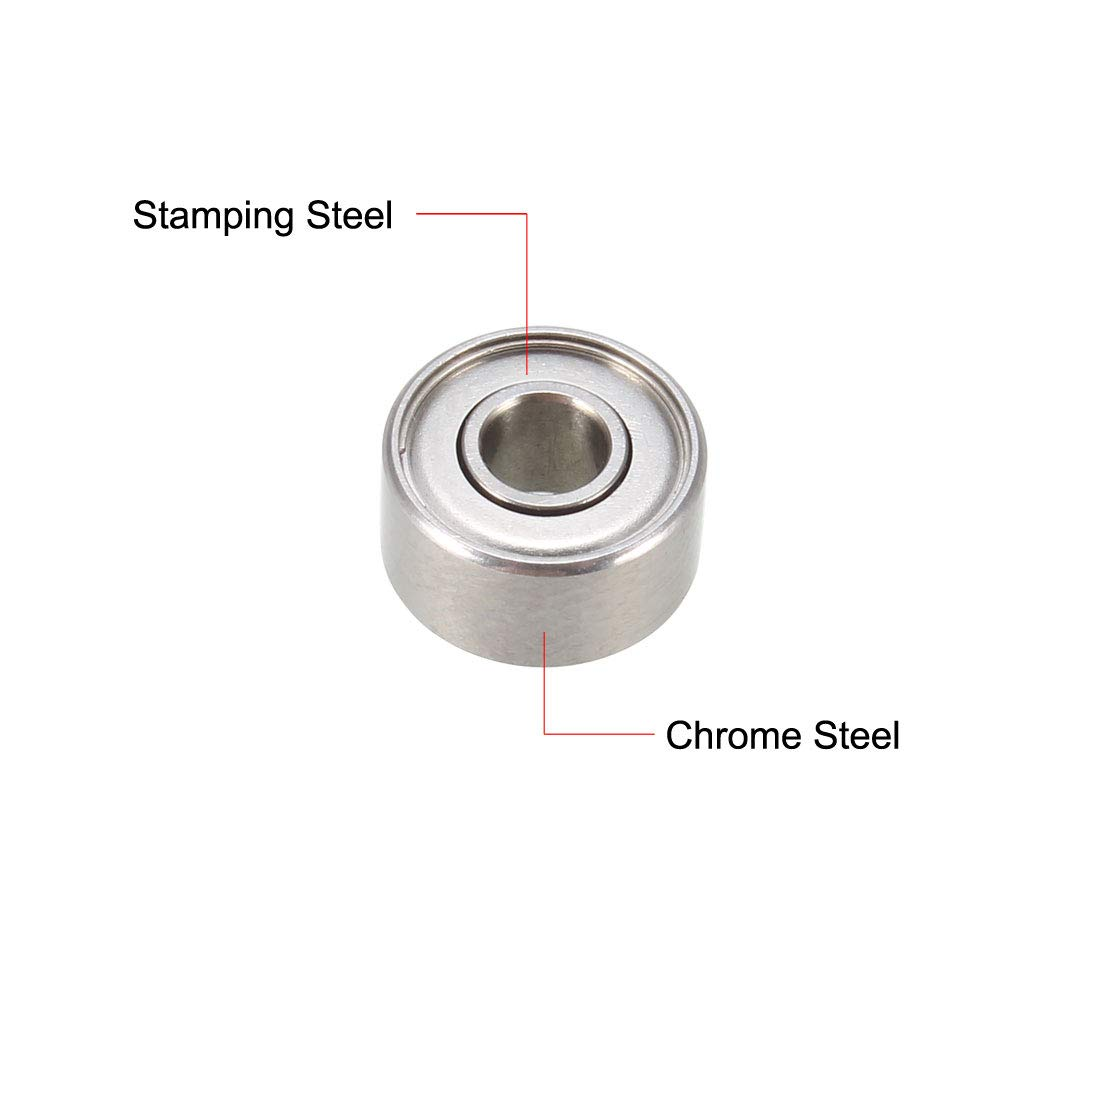 20 PCS Flange Metal Double Shielded Ball Bearing Bearings F696zz 6x15x5 mm